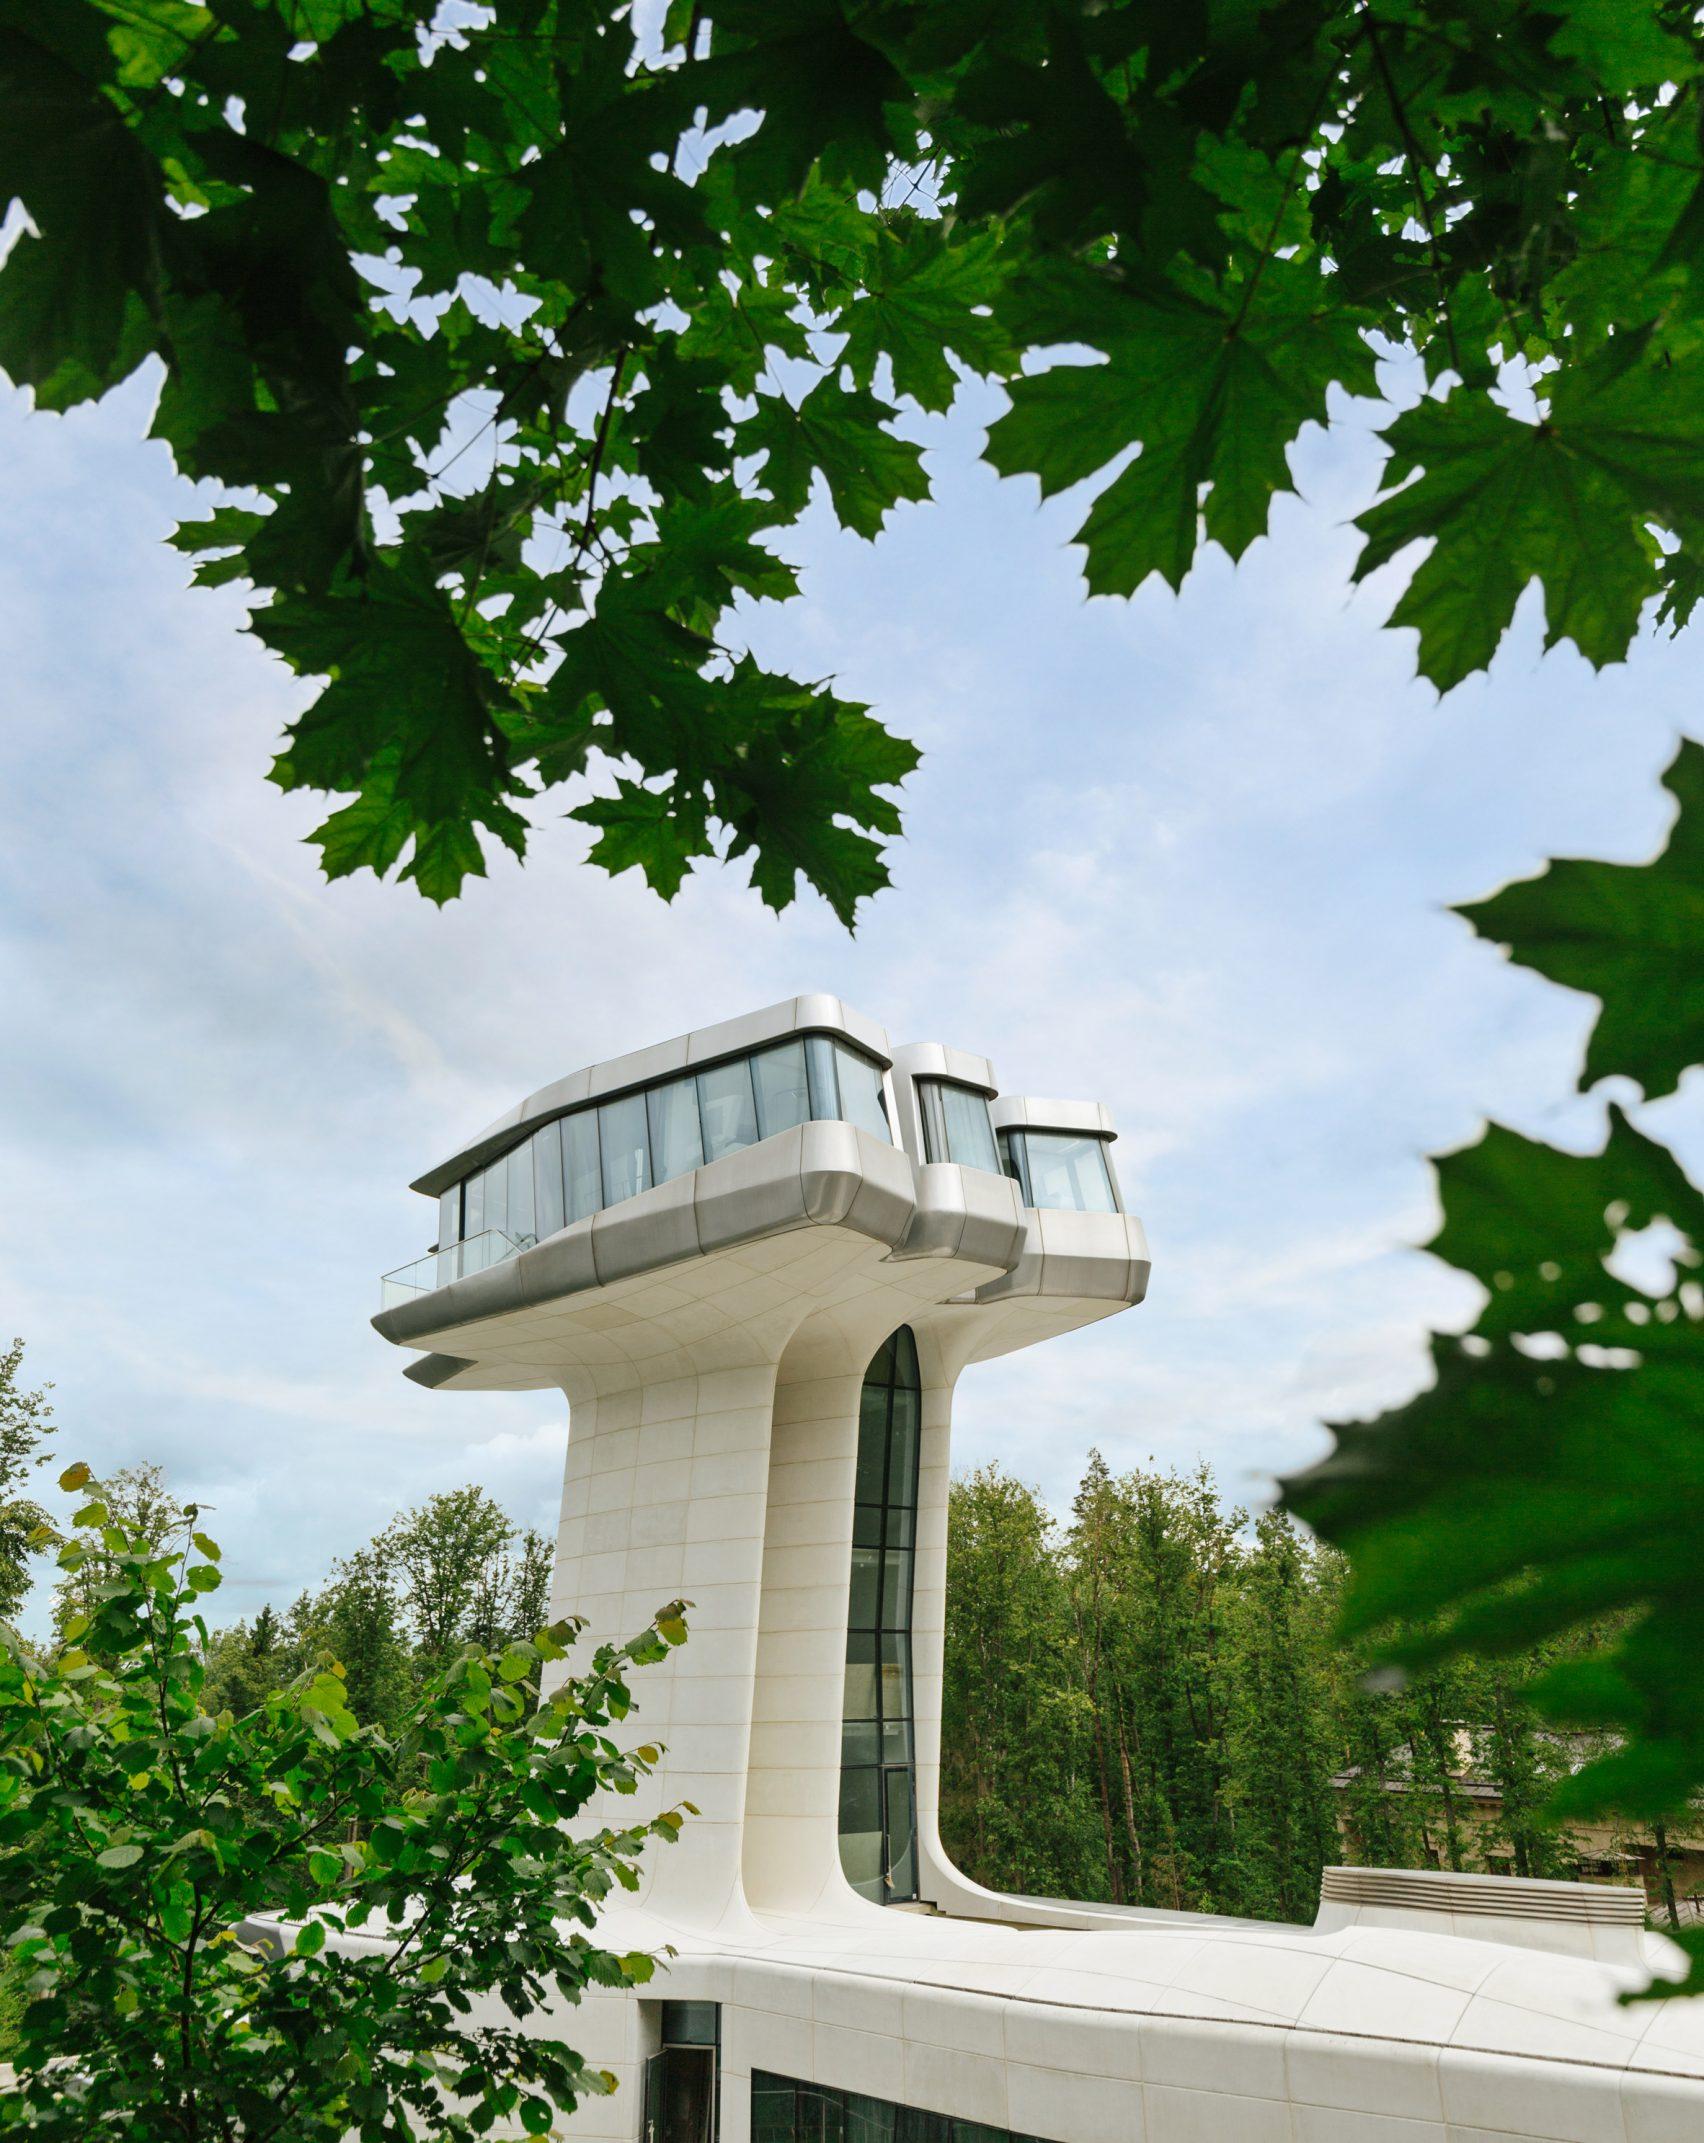 La torre de la casa